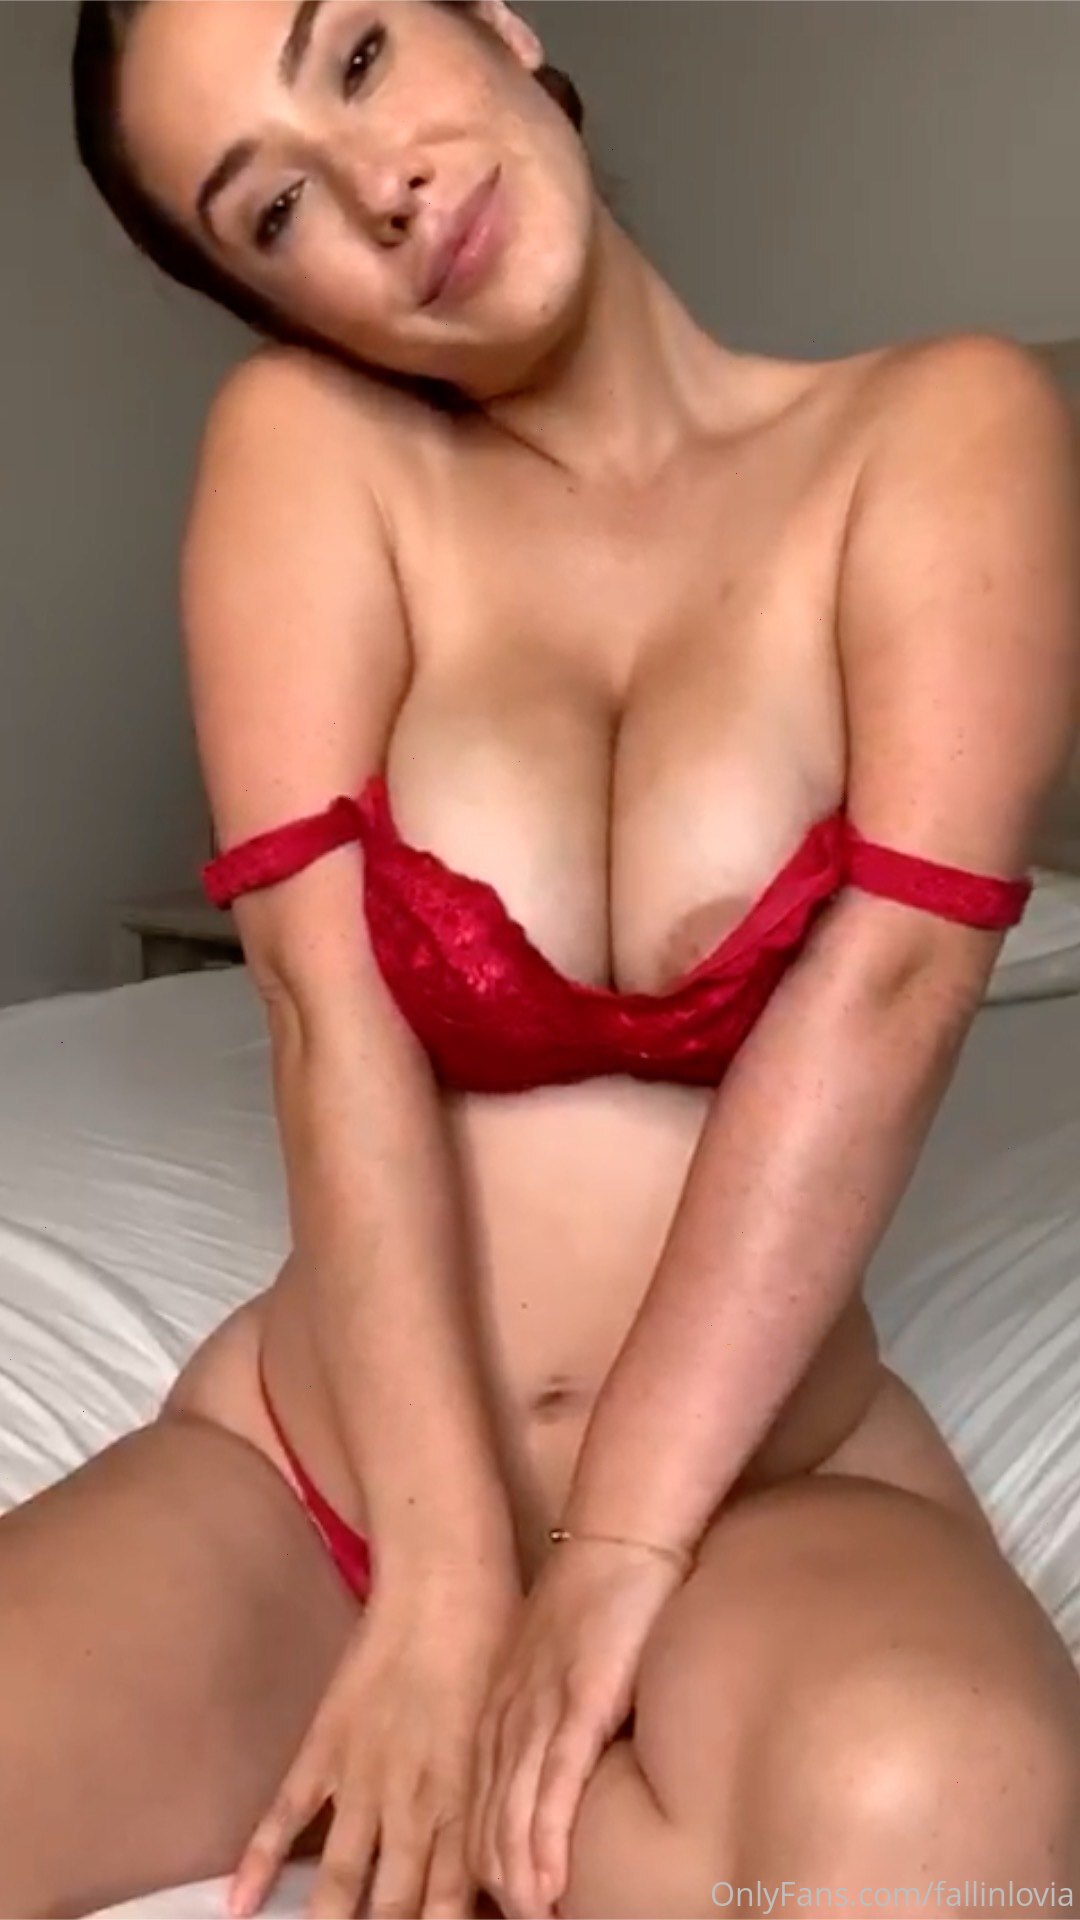 Eva Lovia, Fallinlovia, Onlyfans 0137